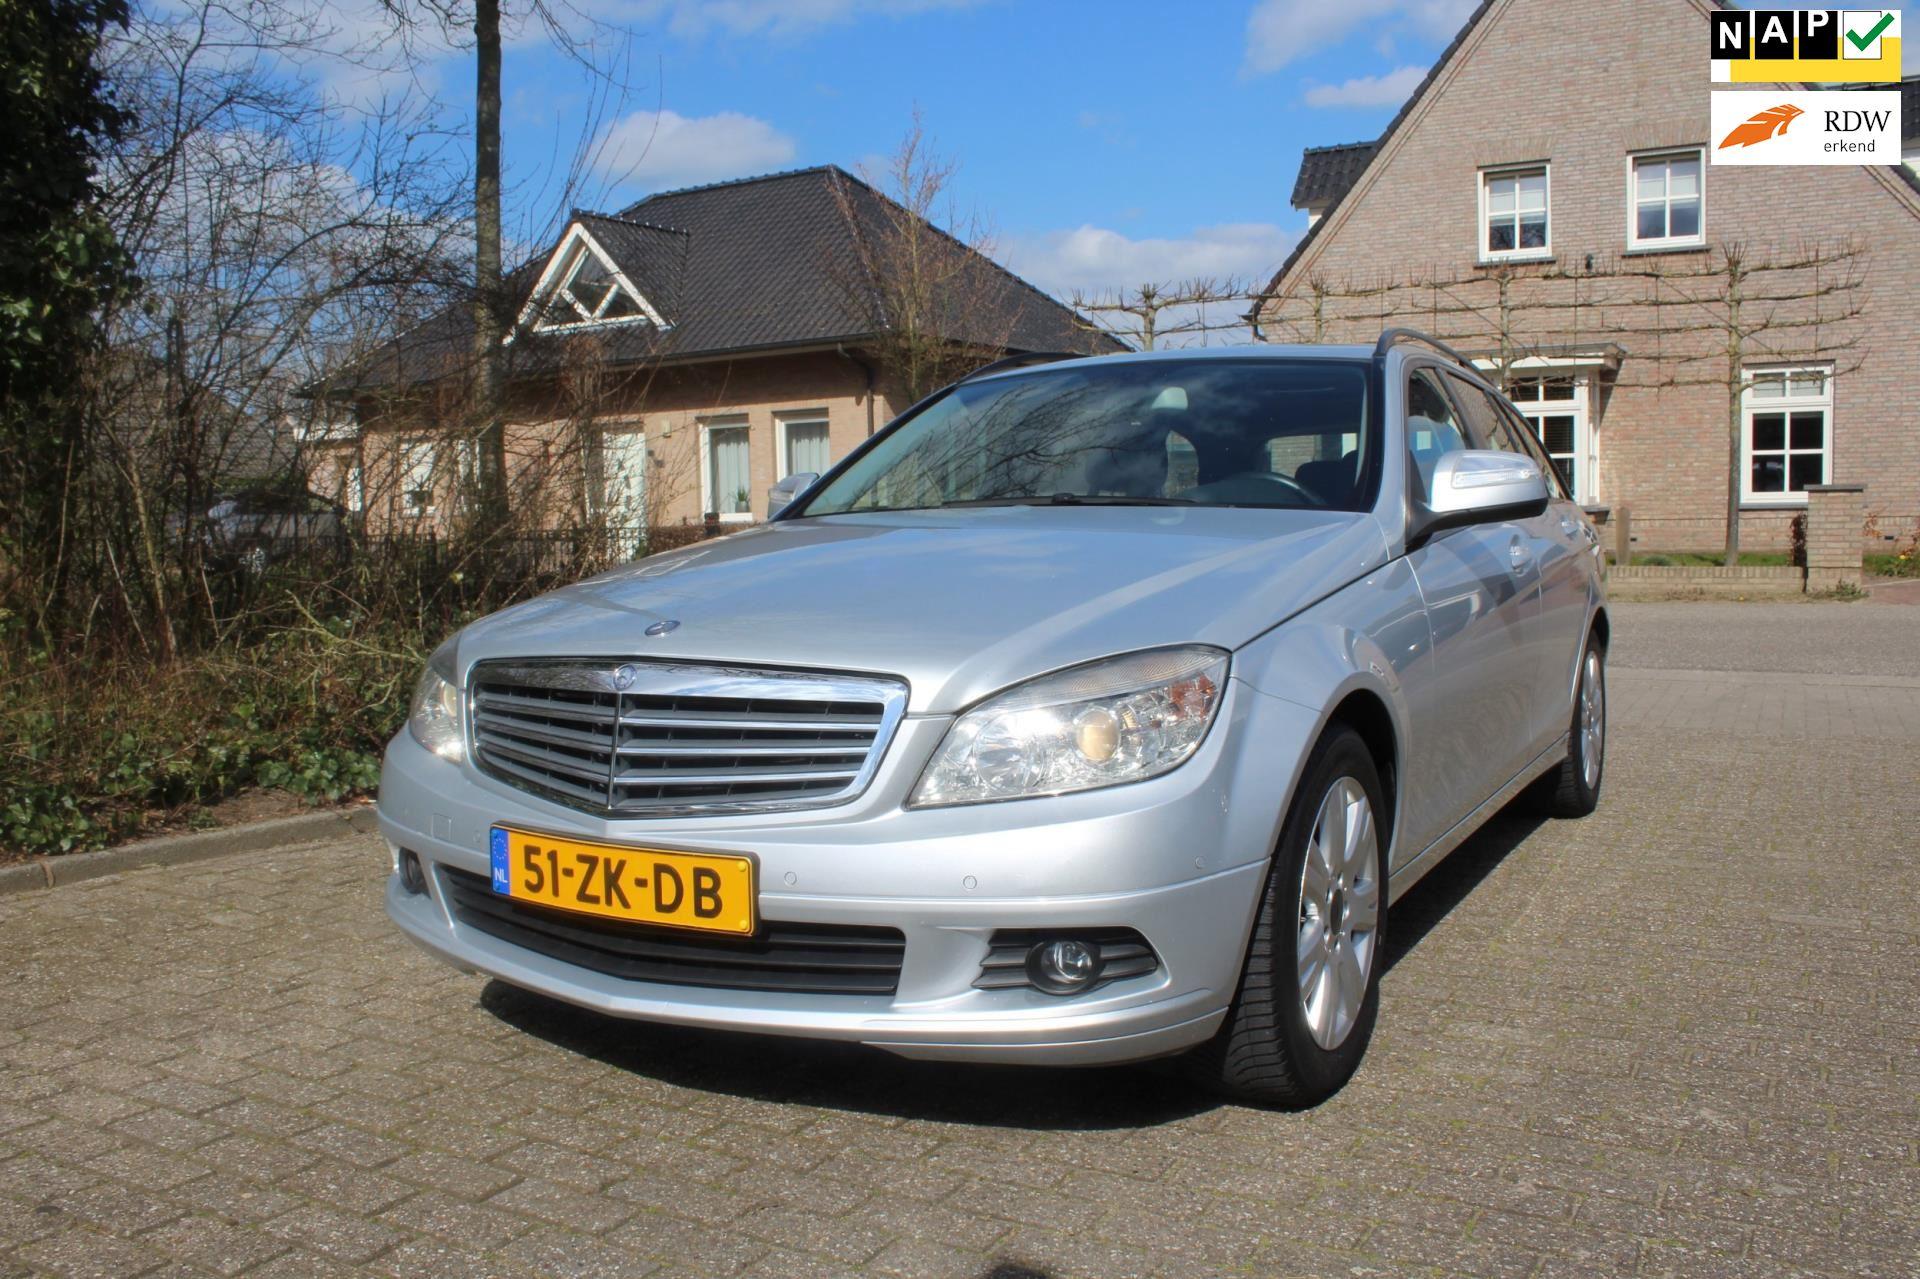 Mercedes-Benz C-klasse Estate occasion - Autogroothandel Ammerzoden